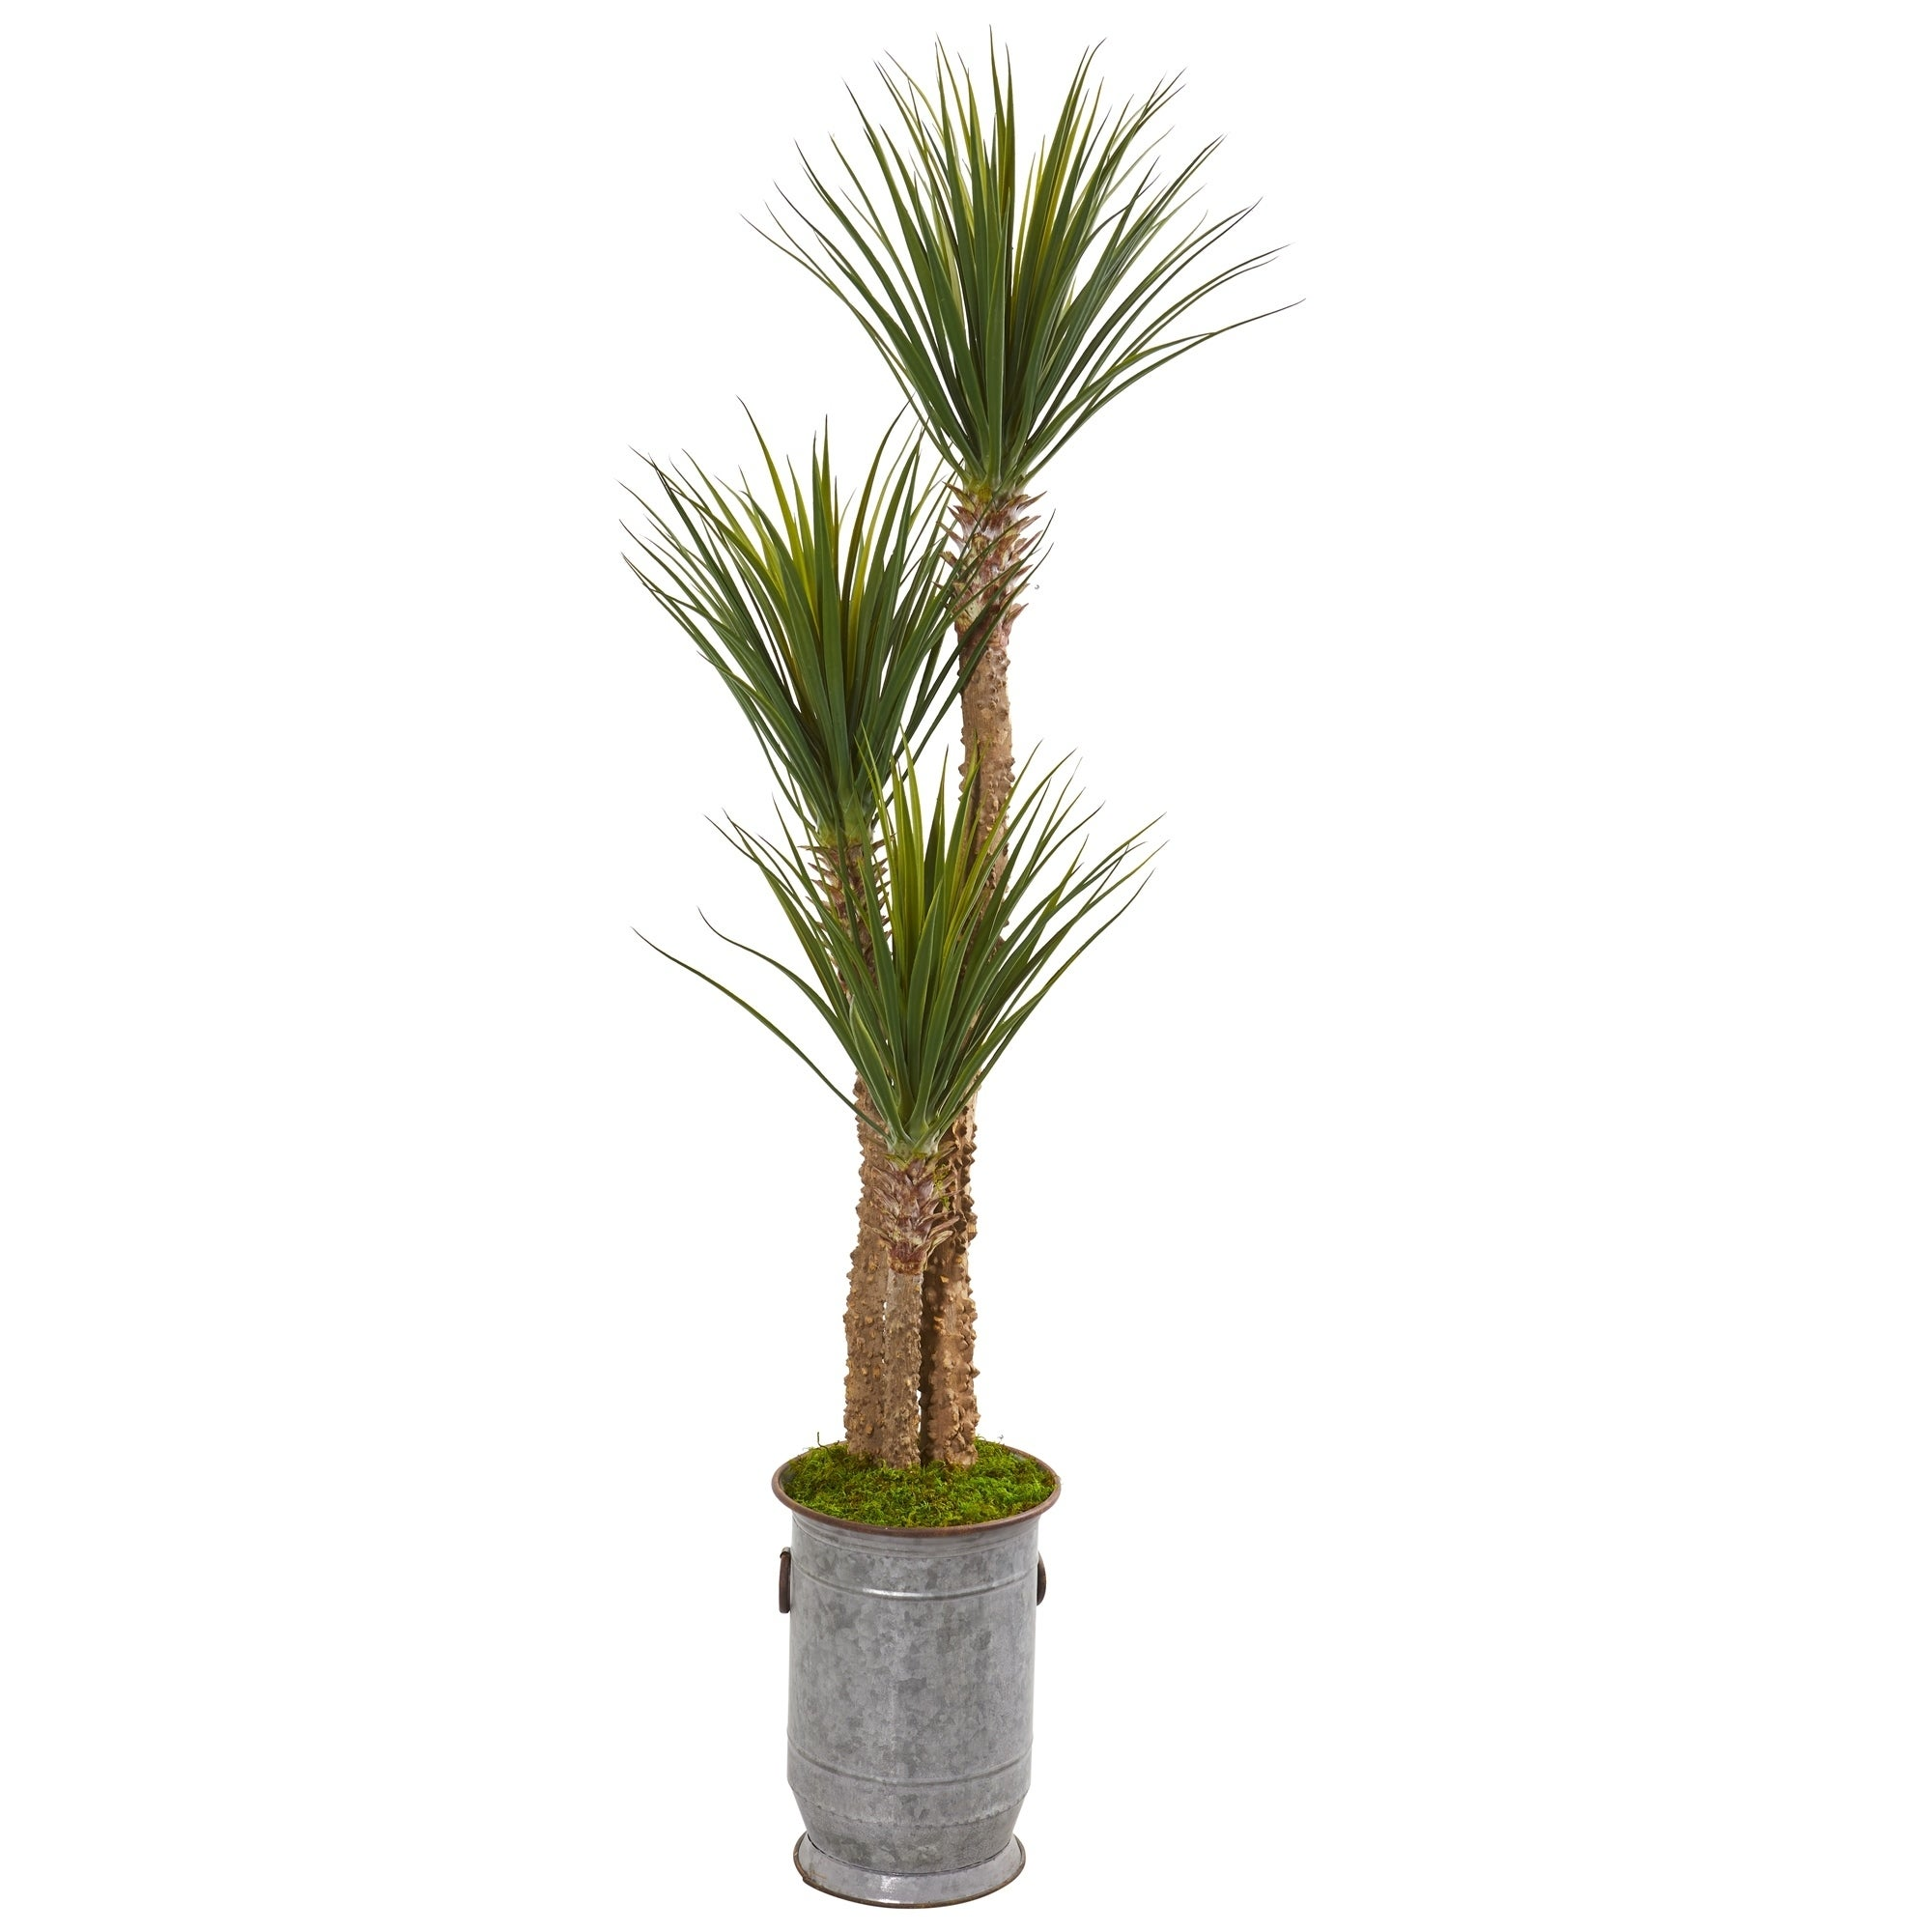 65 Yucca Artificial Tree in Metal Planter